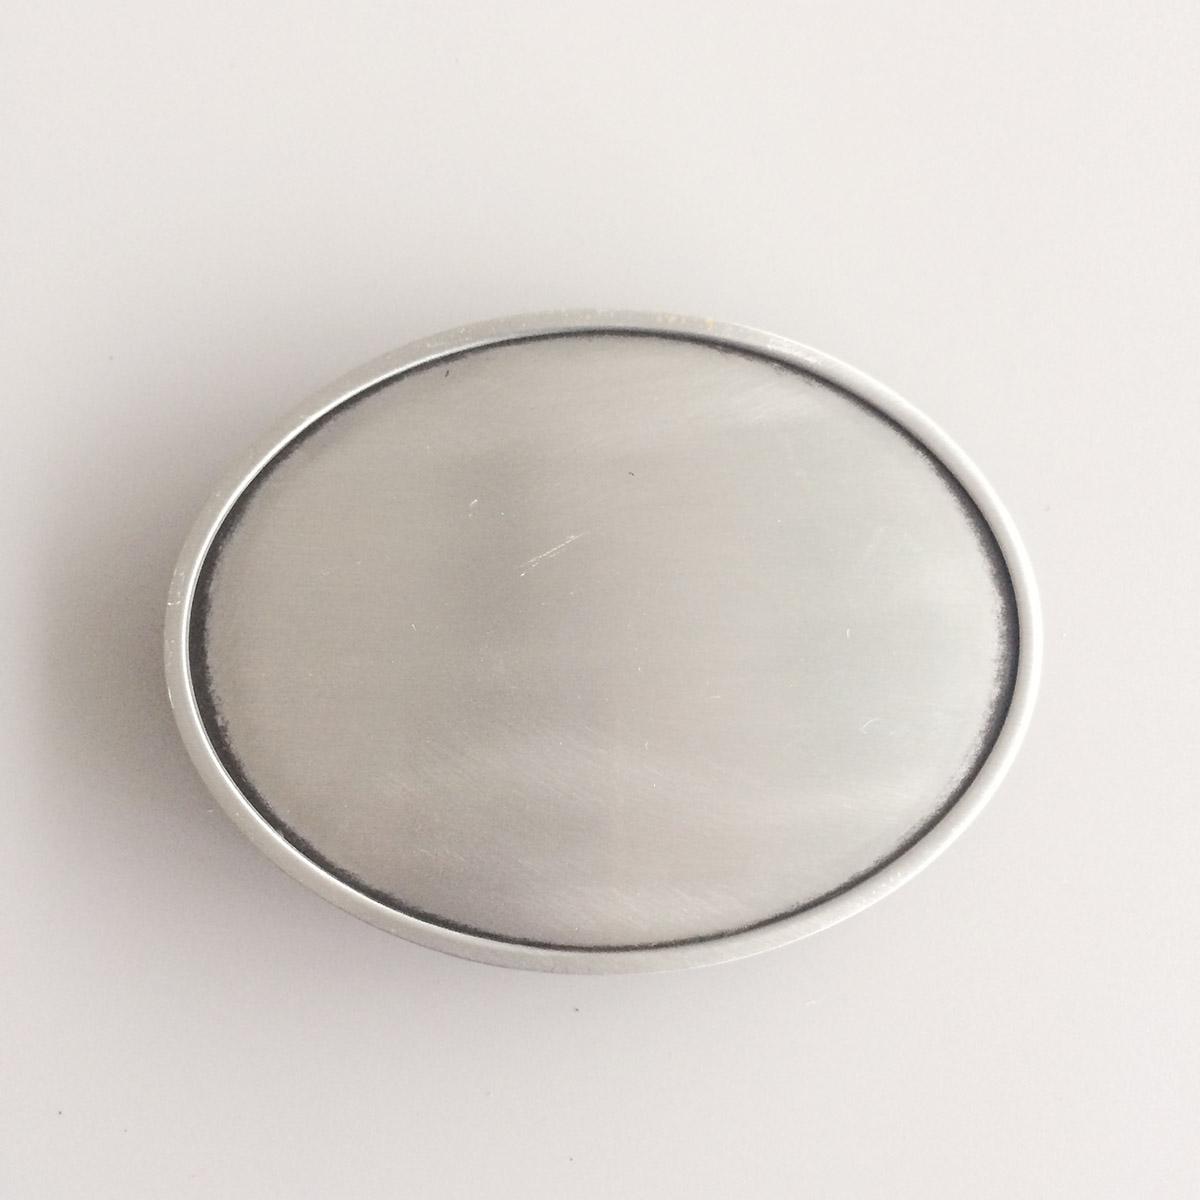 3668765e2ea4 Boucle de ceinture Classique ovale - Boucle-de-ceinture.fr